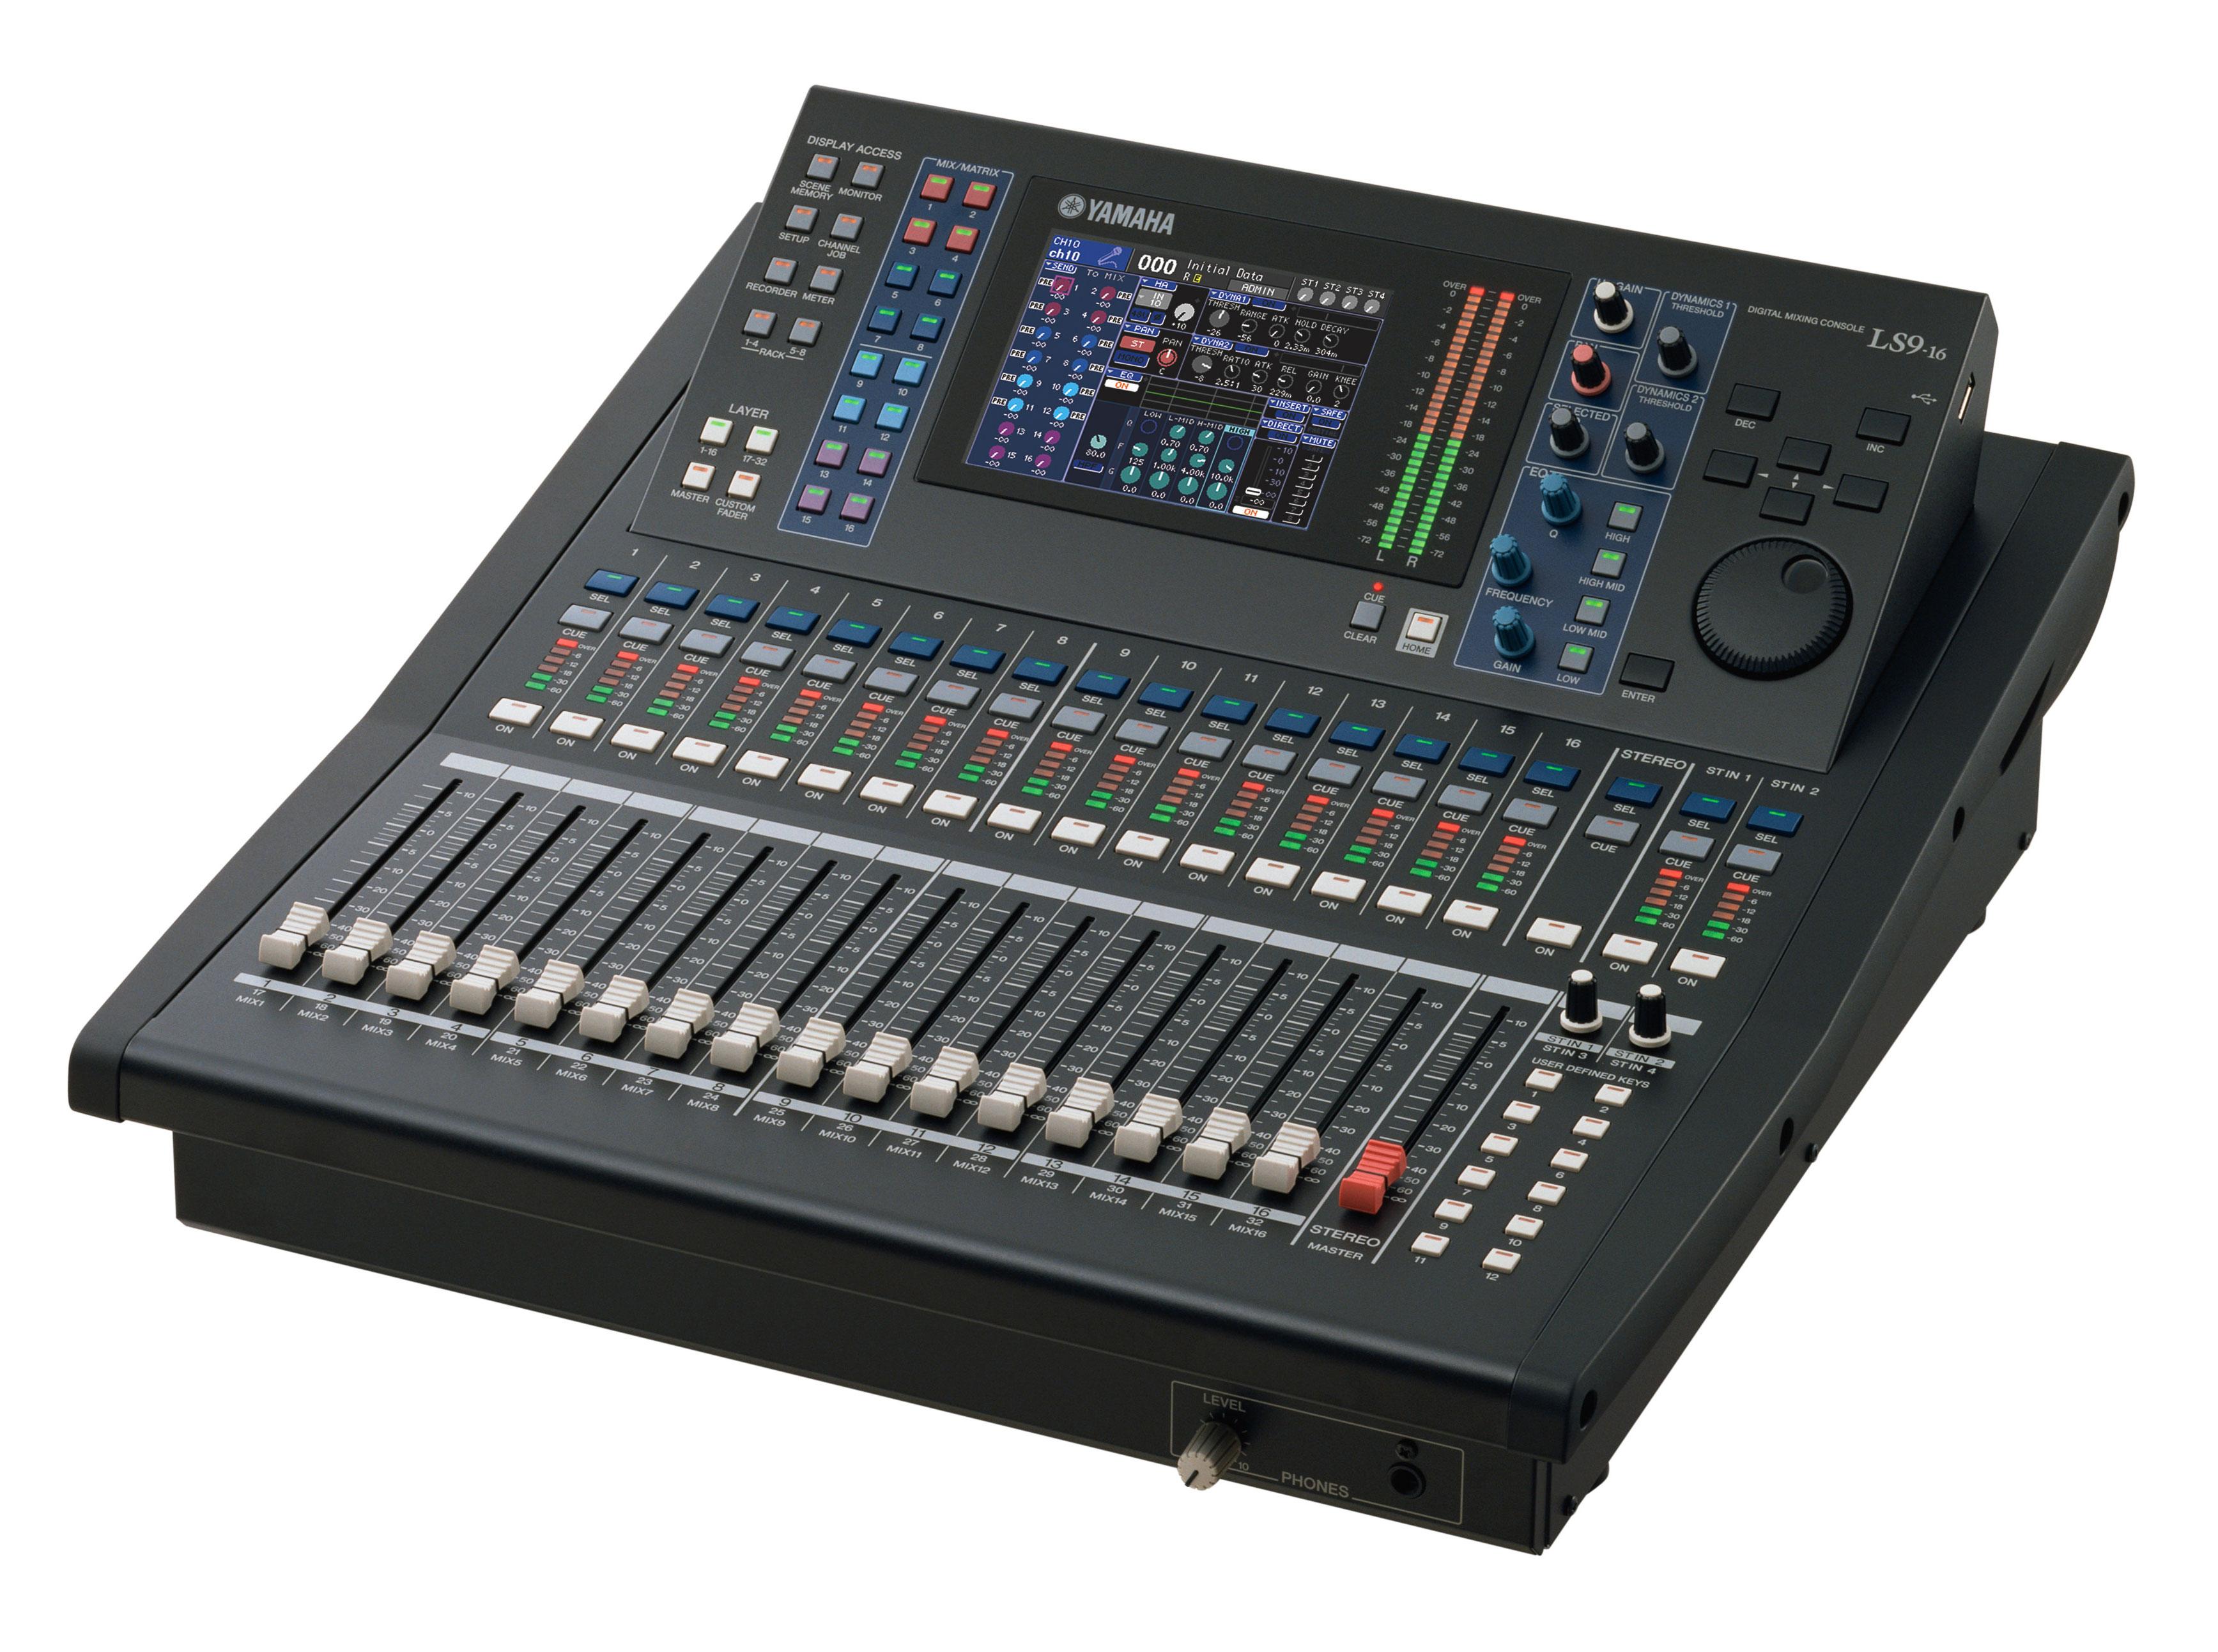 Yamaha-ls9-16